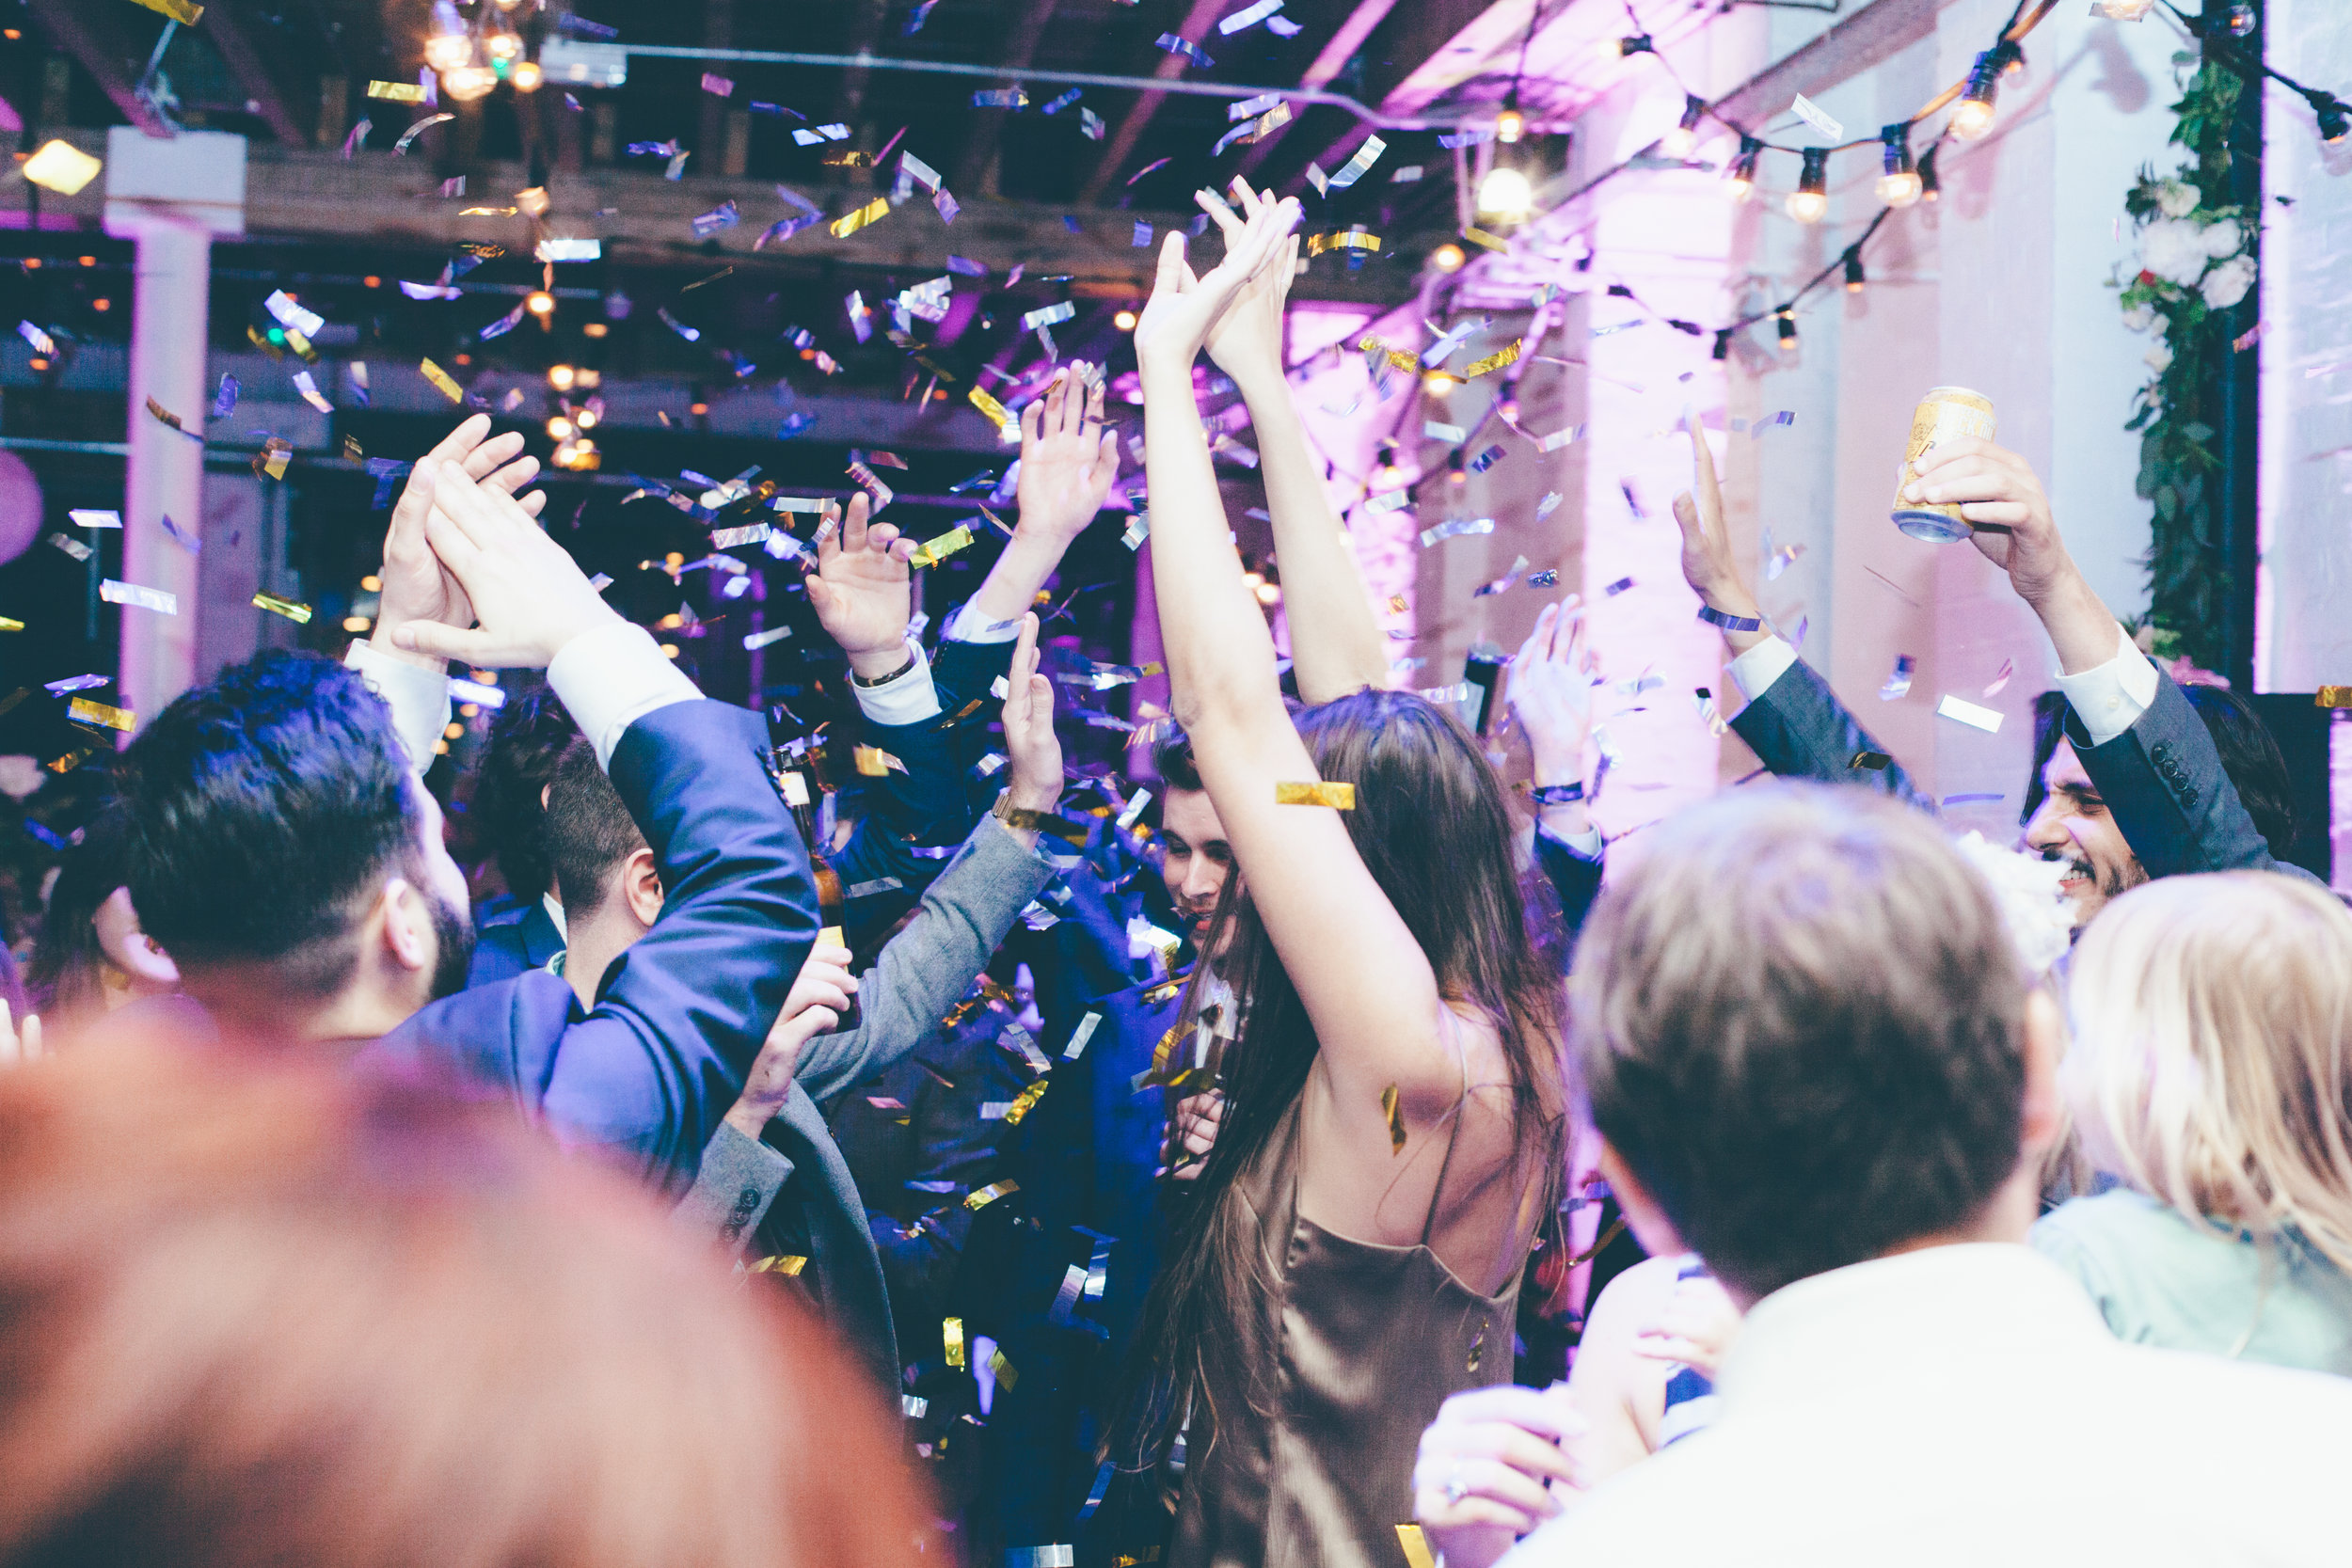 Quirky Venue, Dry hire venue, Non-traditional wedding planner, London Wedding coordination, Bespoke weddings, Brixton East 1871 Wedding, informal, Stylish wedding, Warehouse wedding